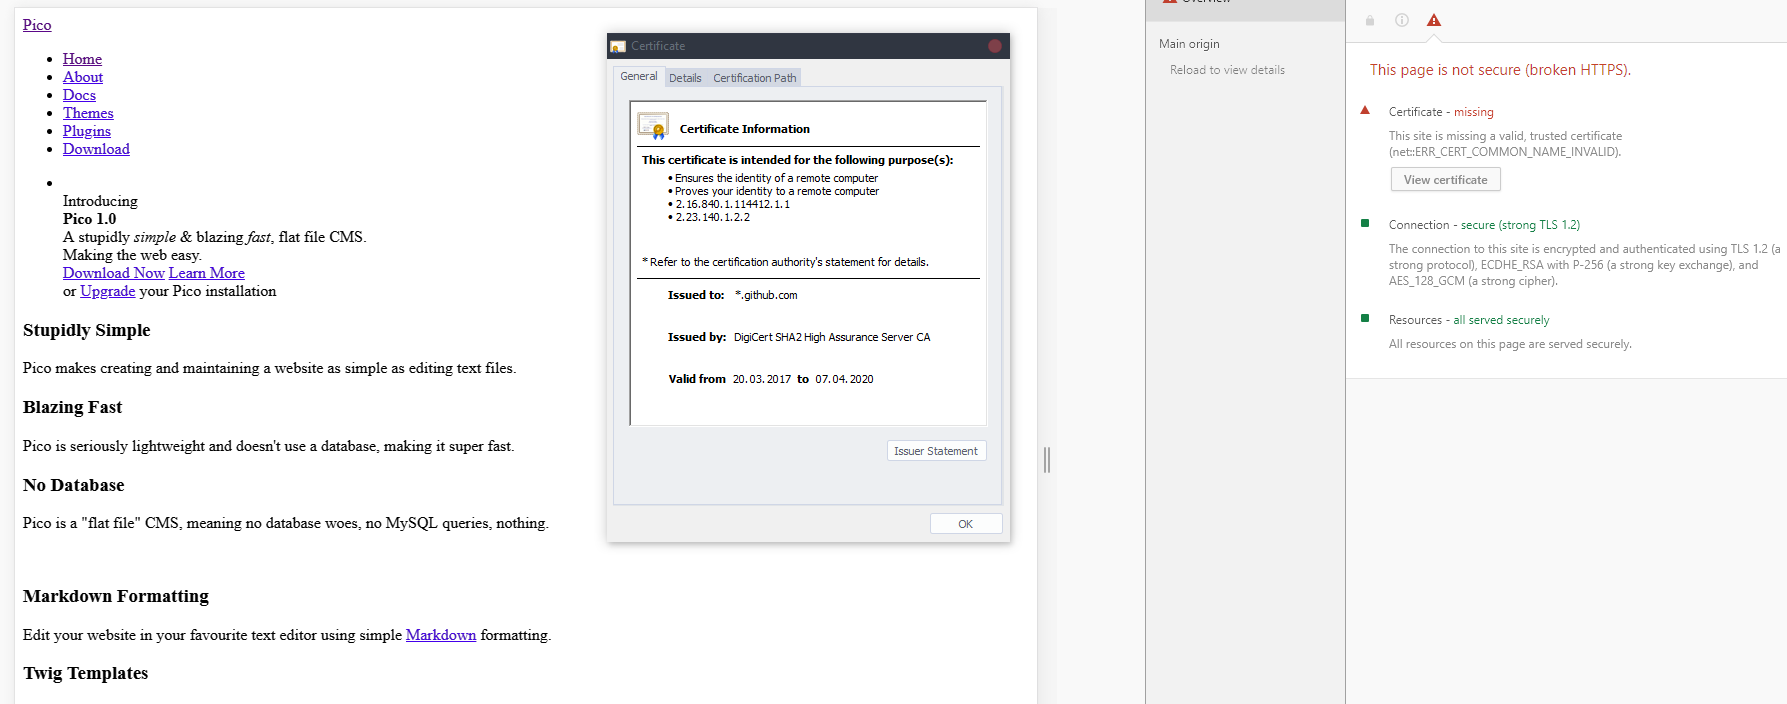 Picocms org is broken when using https · Issue #437